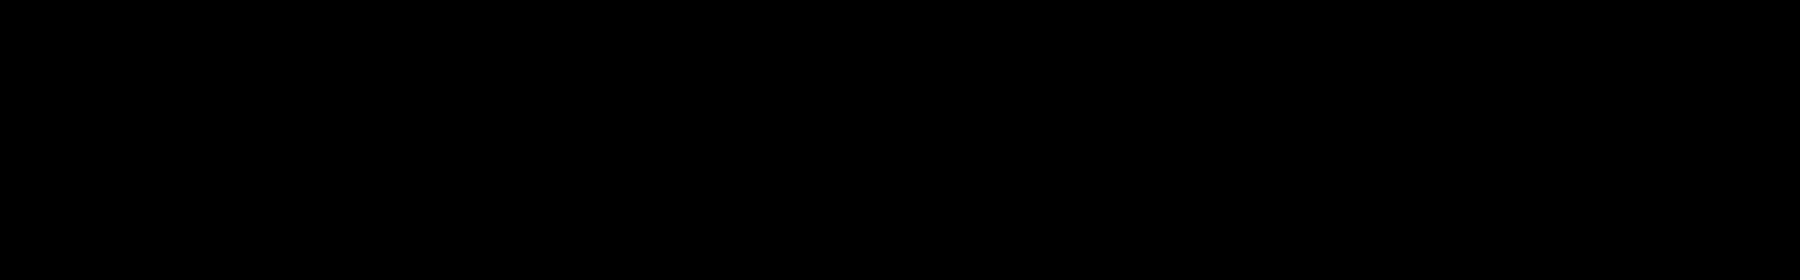 FSTVL Trap audio waveform